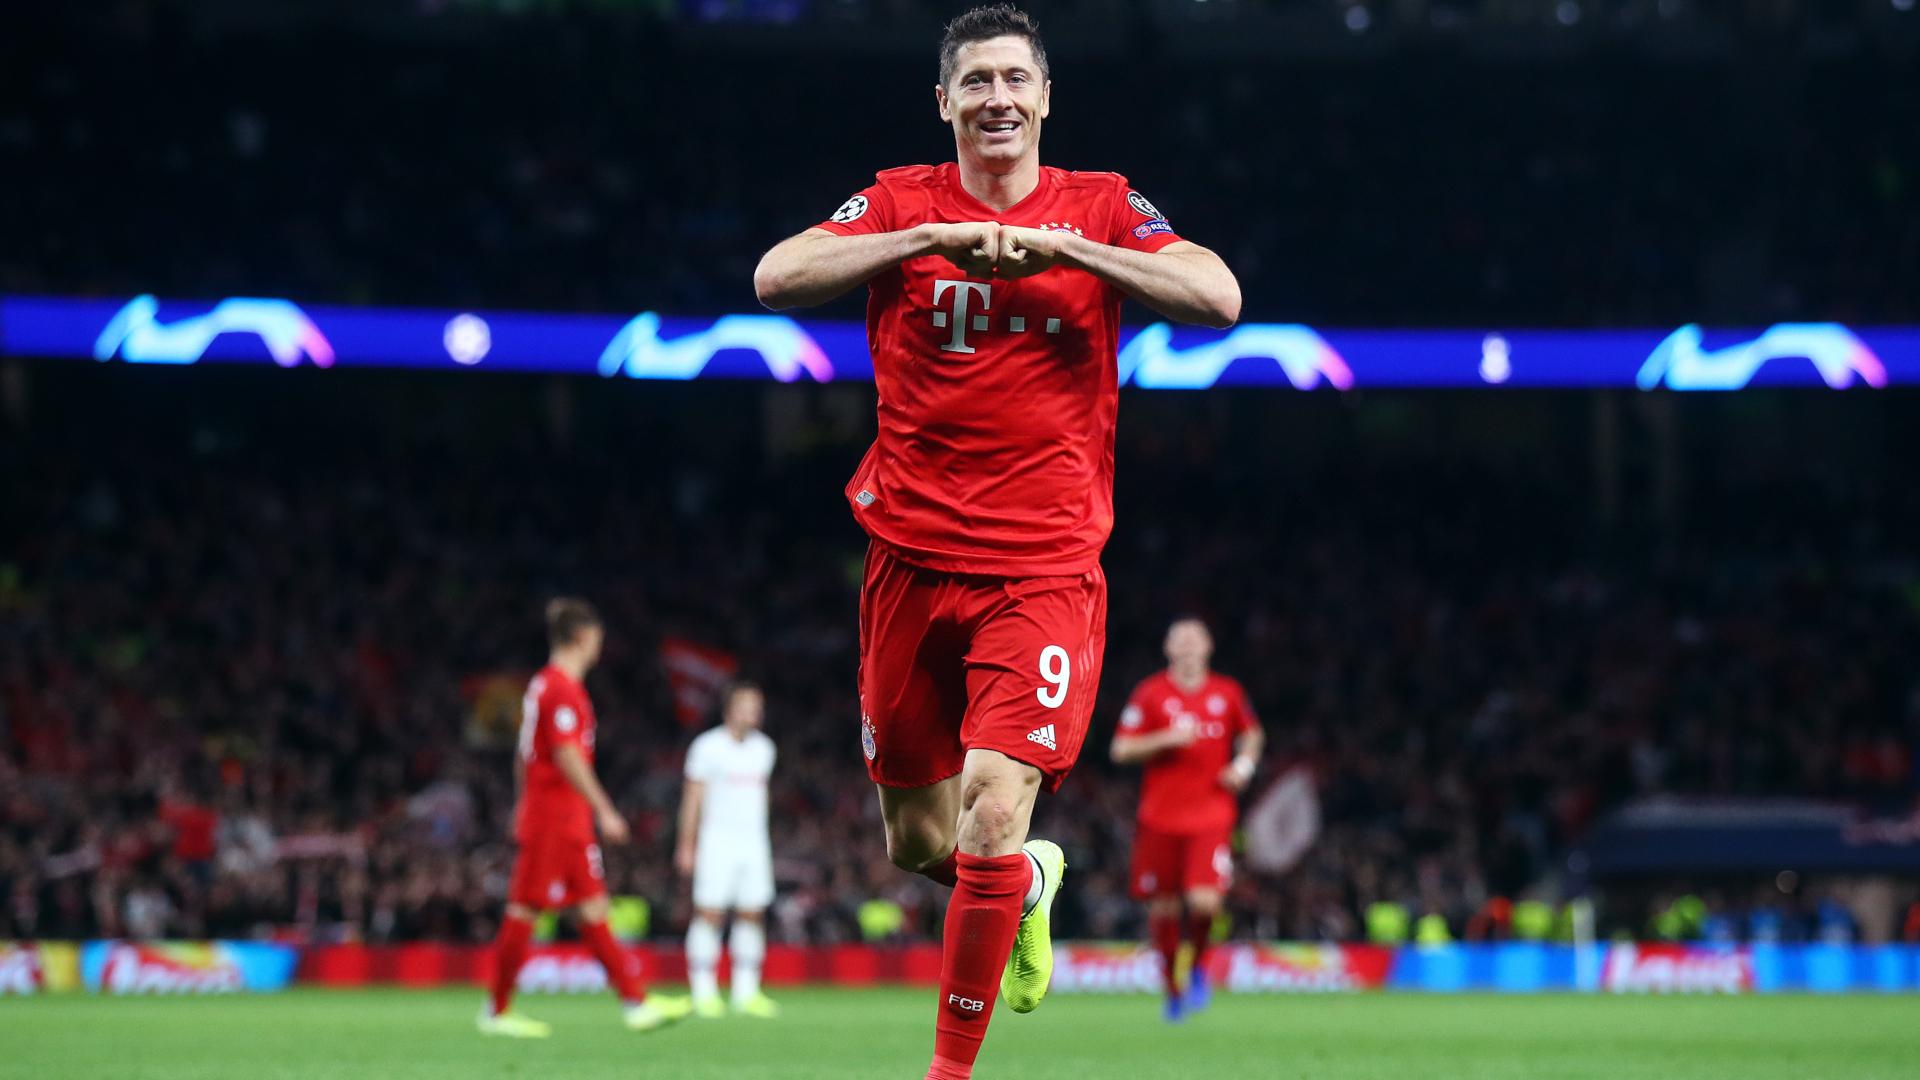 ONYL GER Robert Lewandowski FC Bayern München CL vs. Tottenham Hotspur 01102019